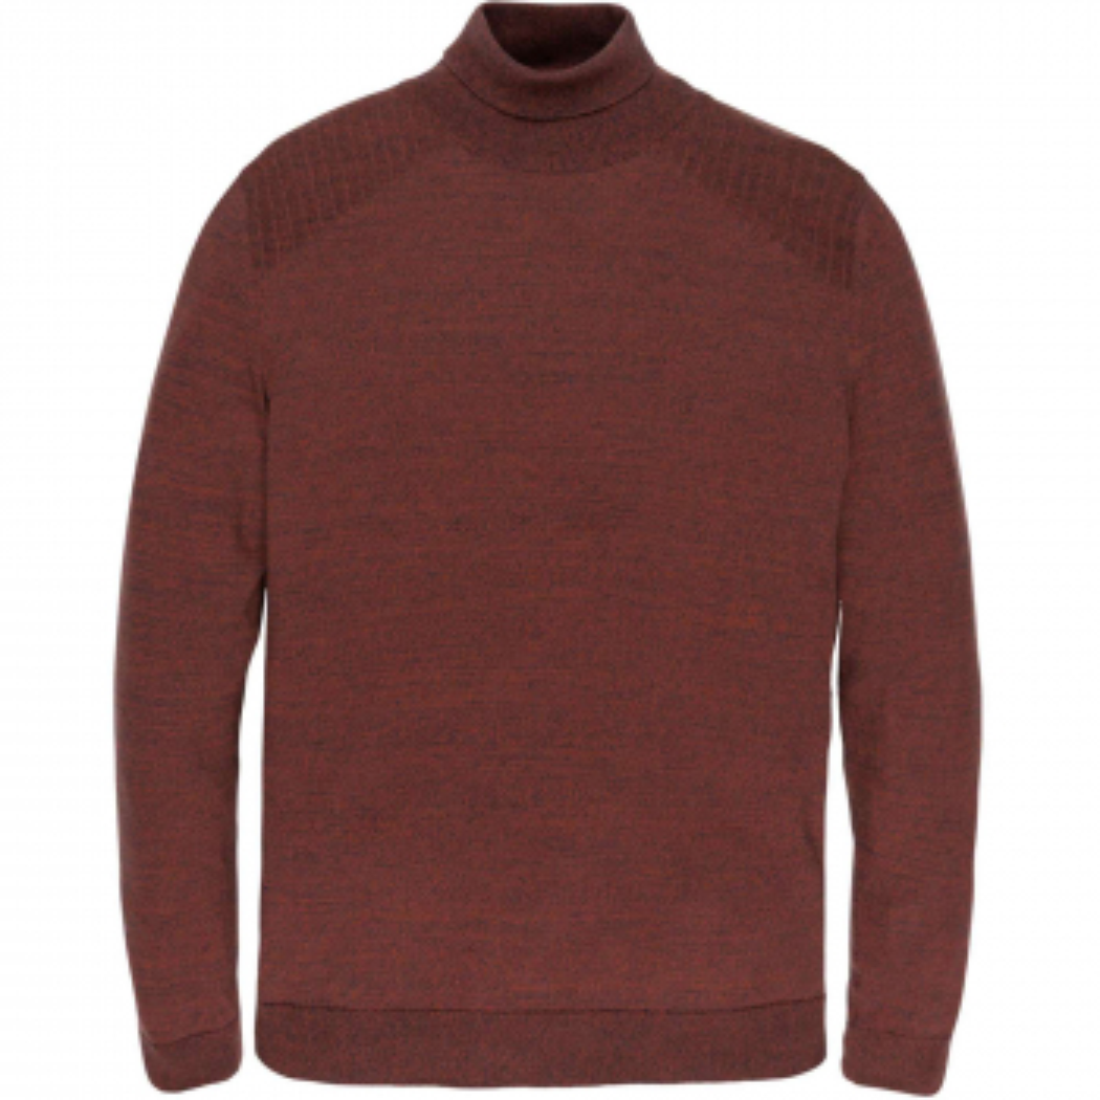 Turtleneck cotton 2 tone mouline red ochre